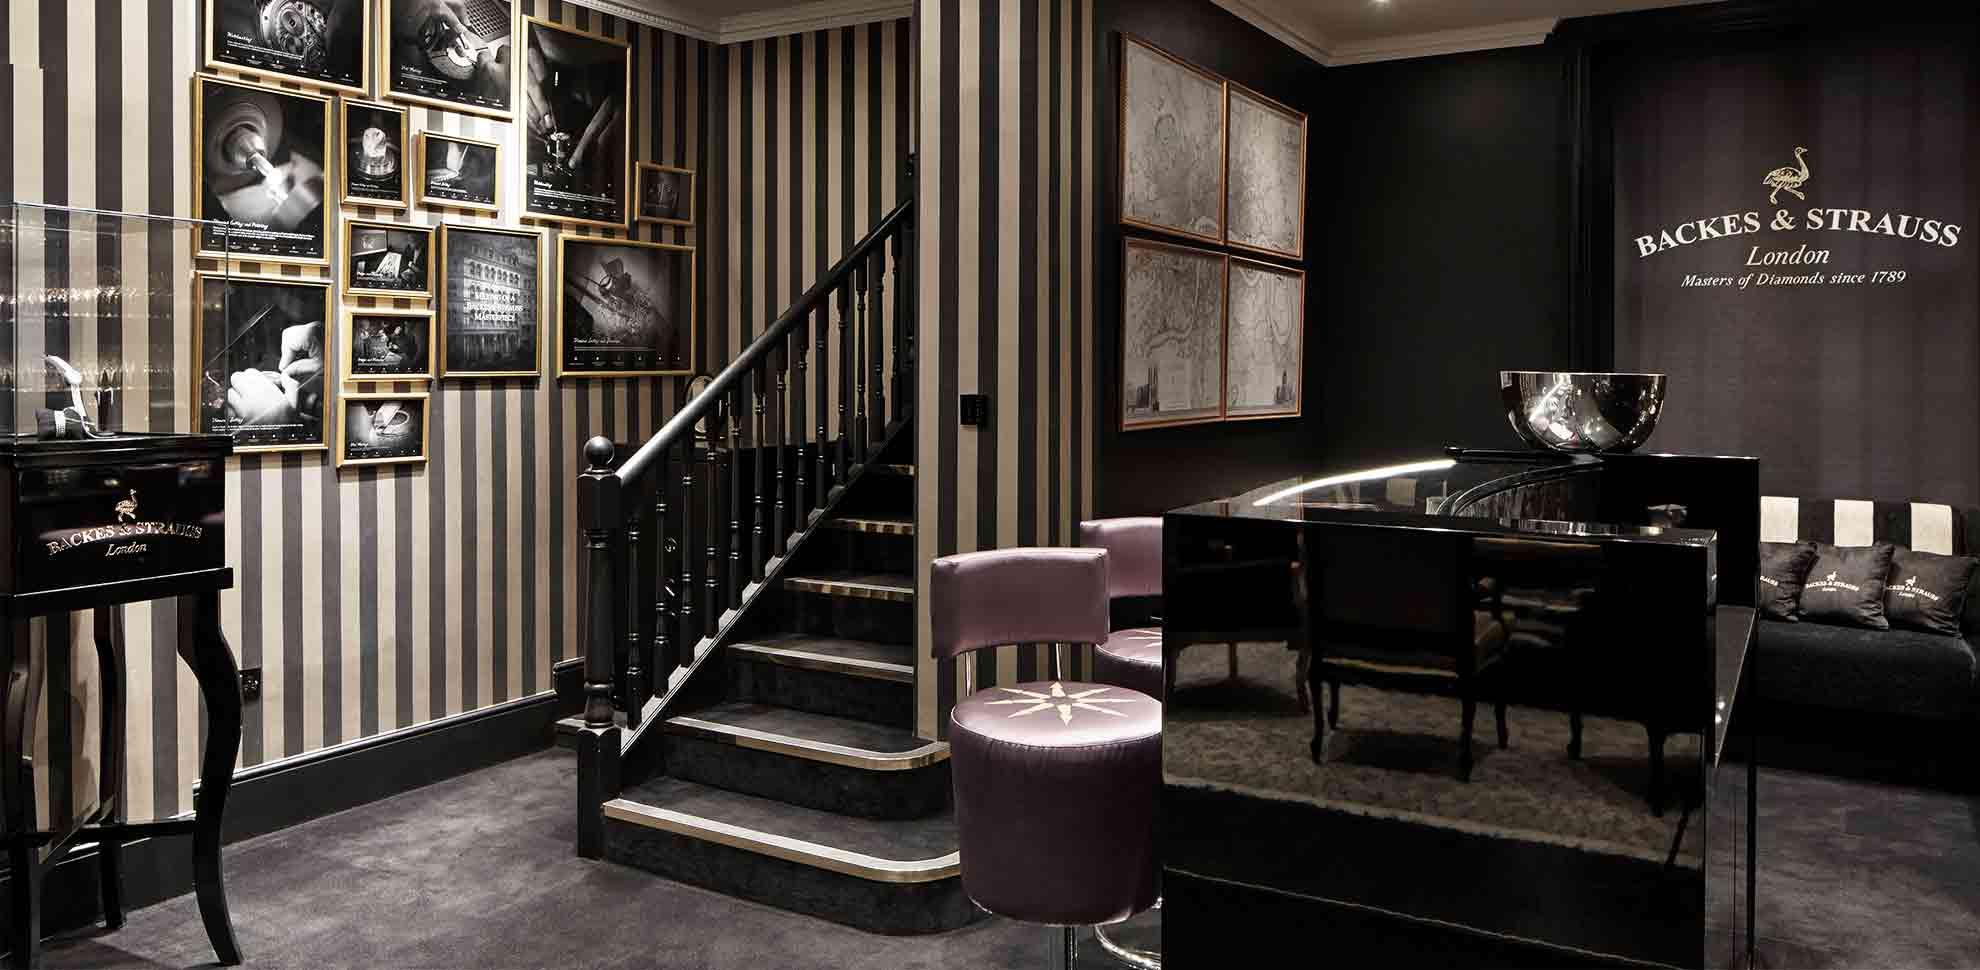 Backes & Strauss London lounge